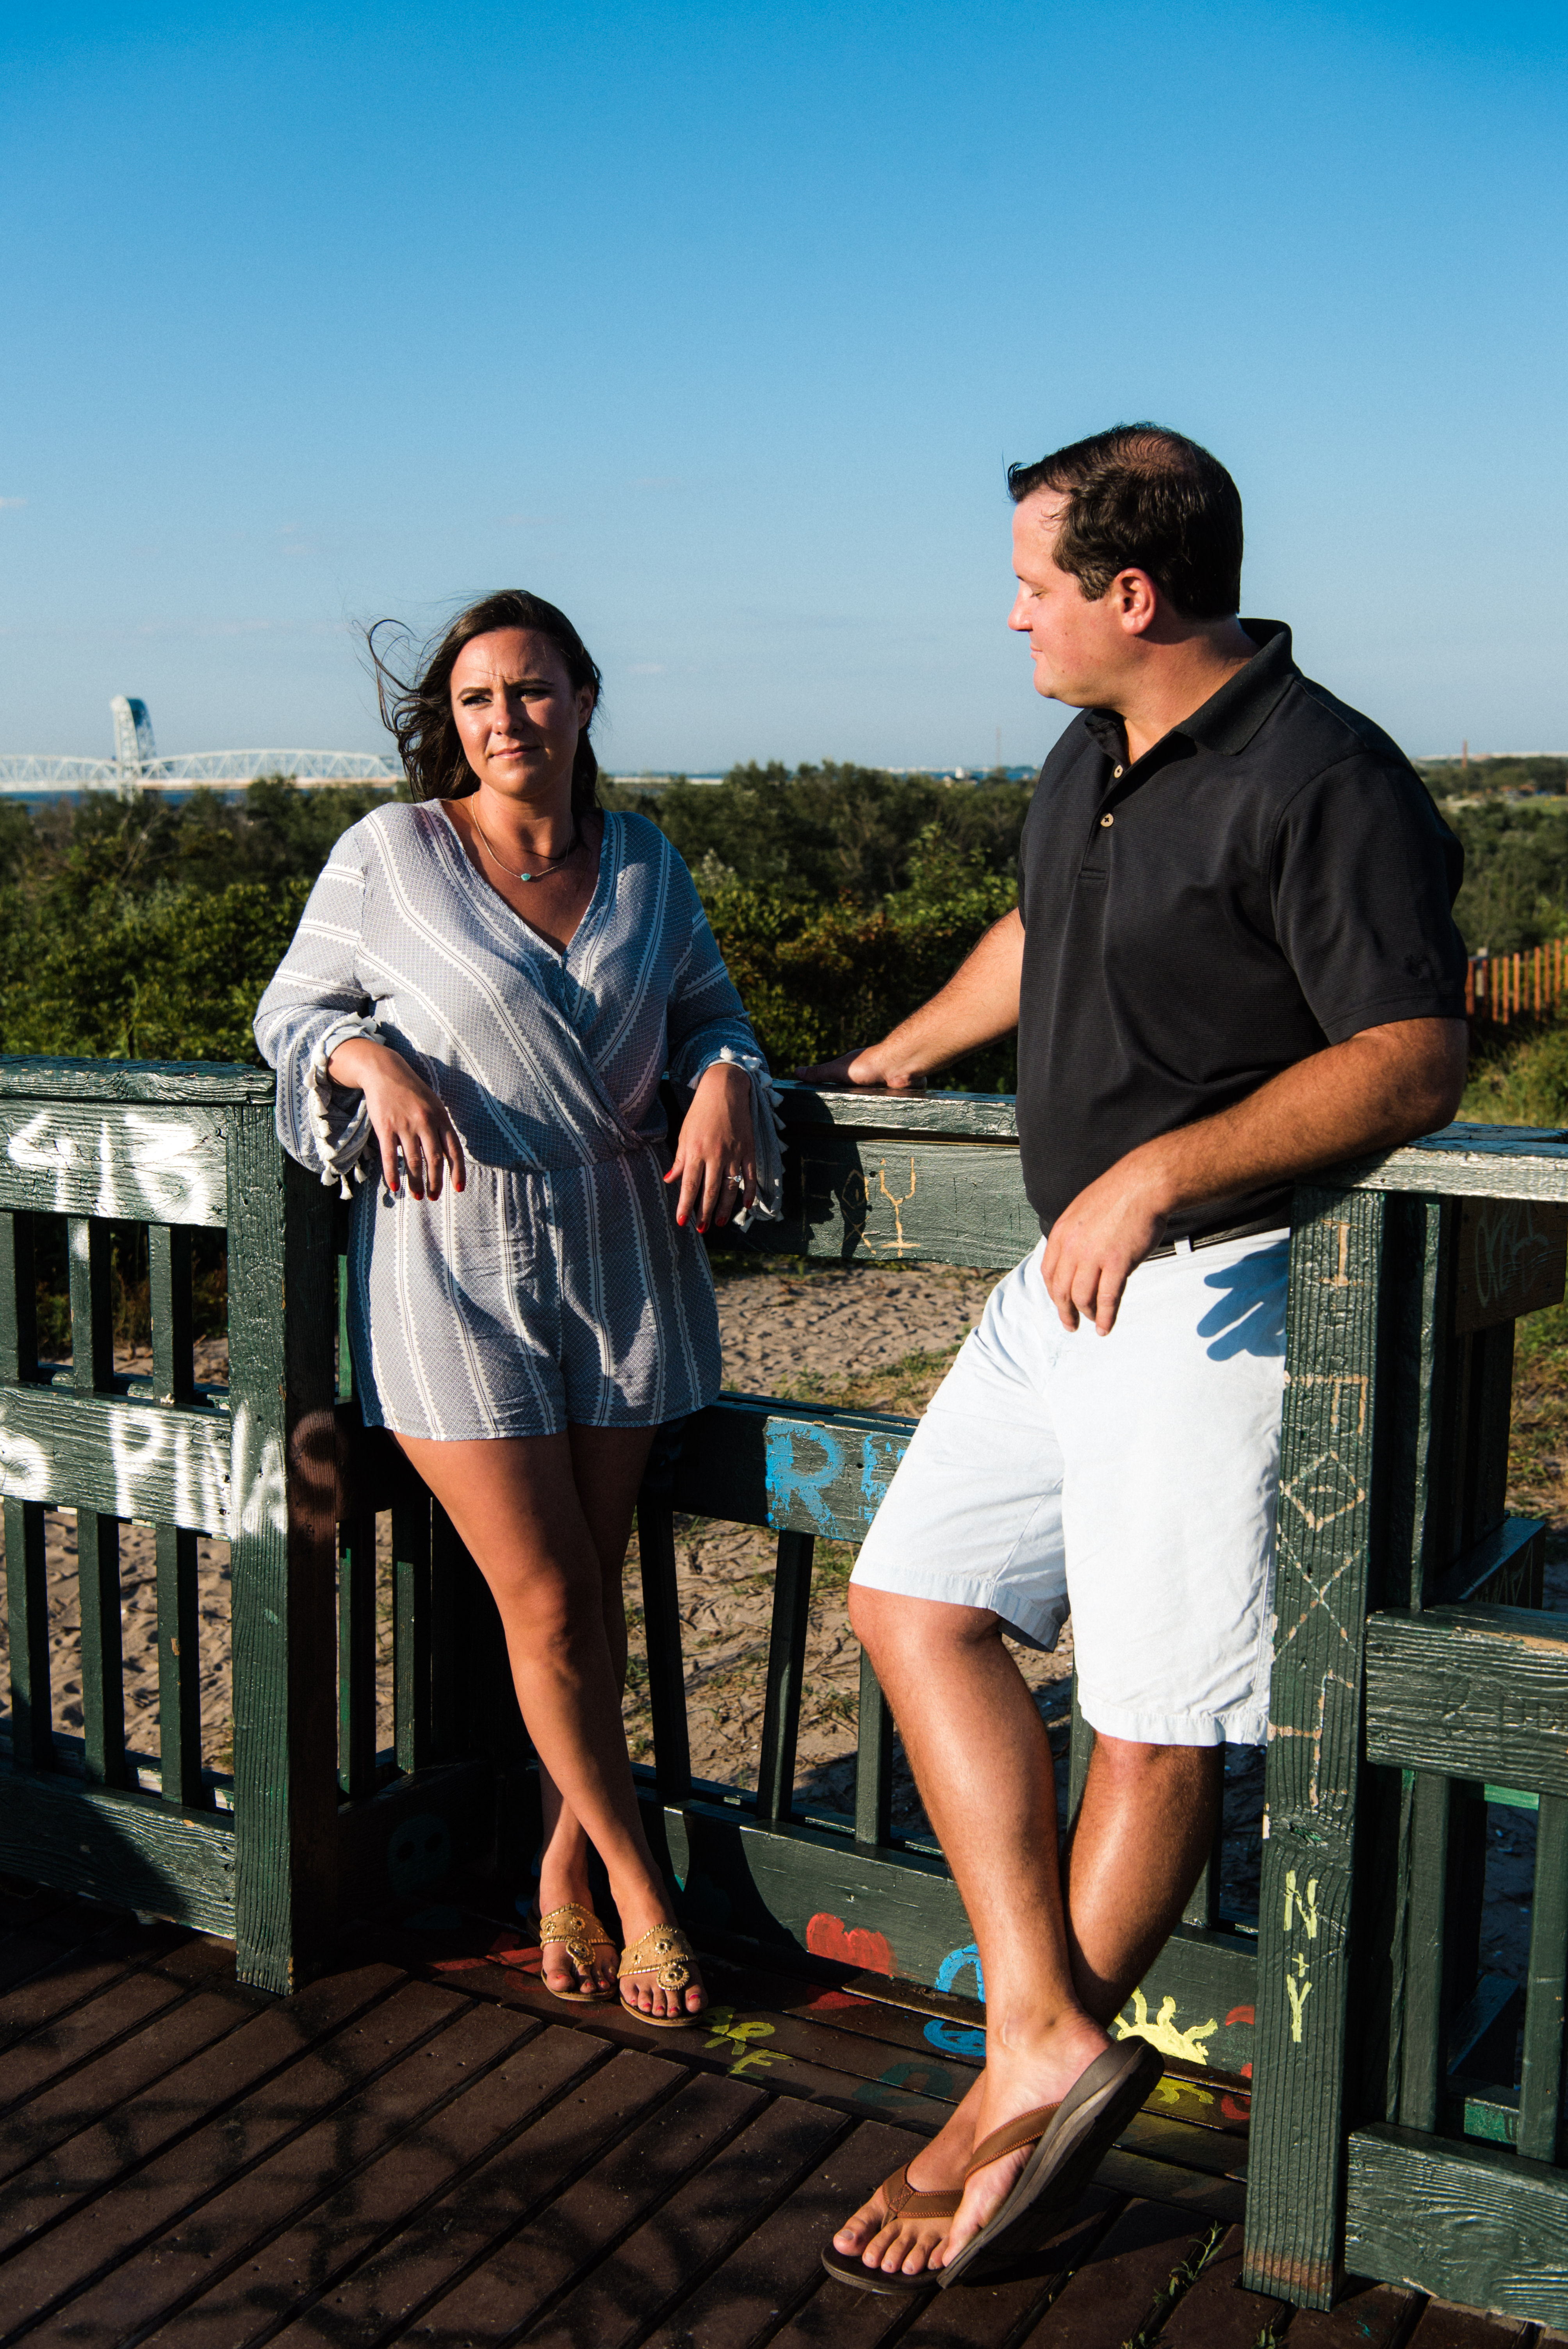 long-beach-engagement-photos